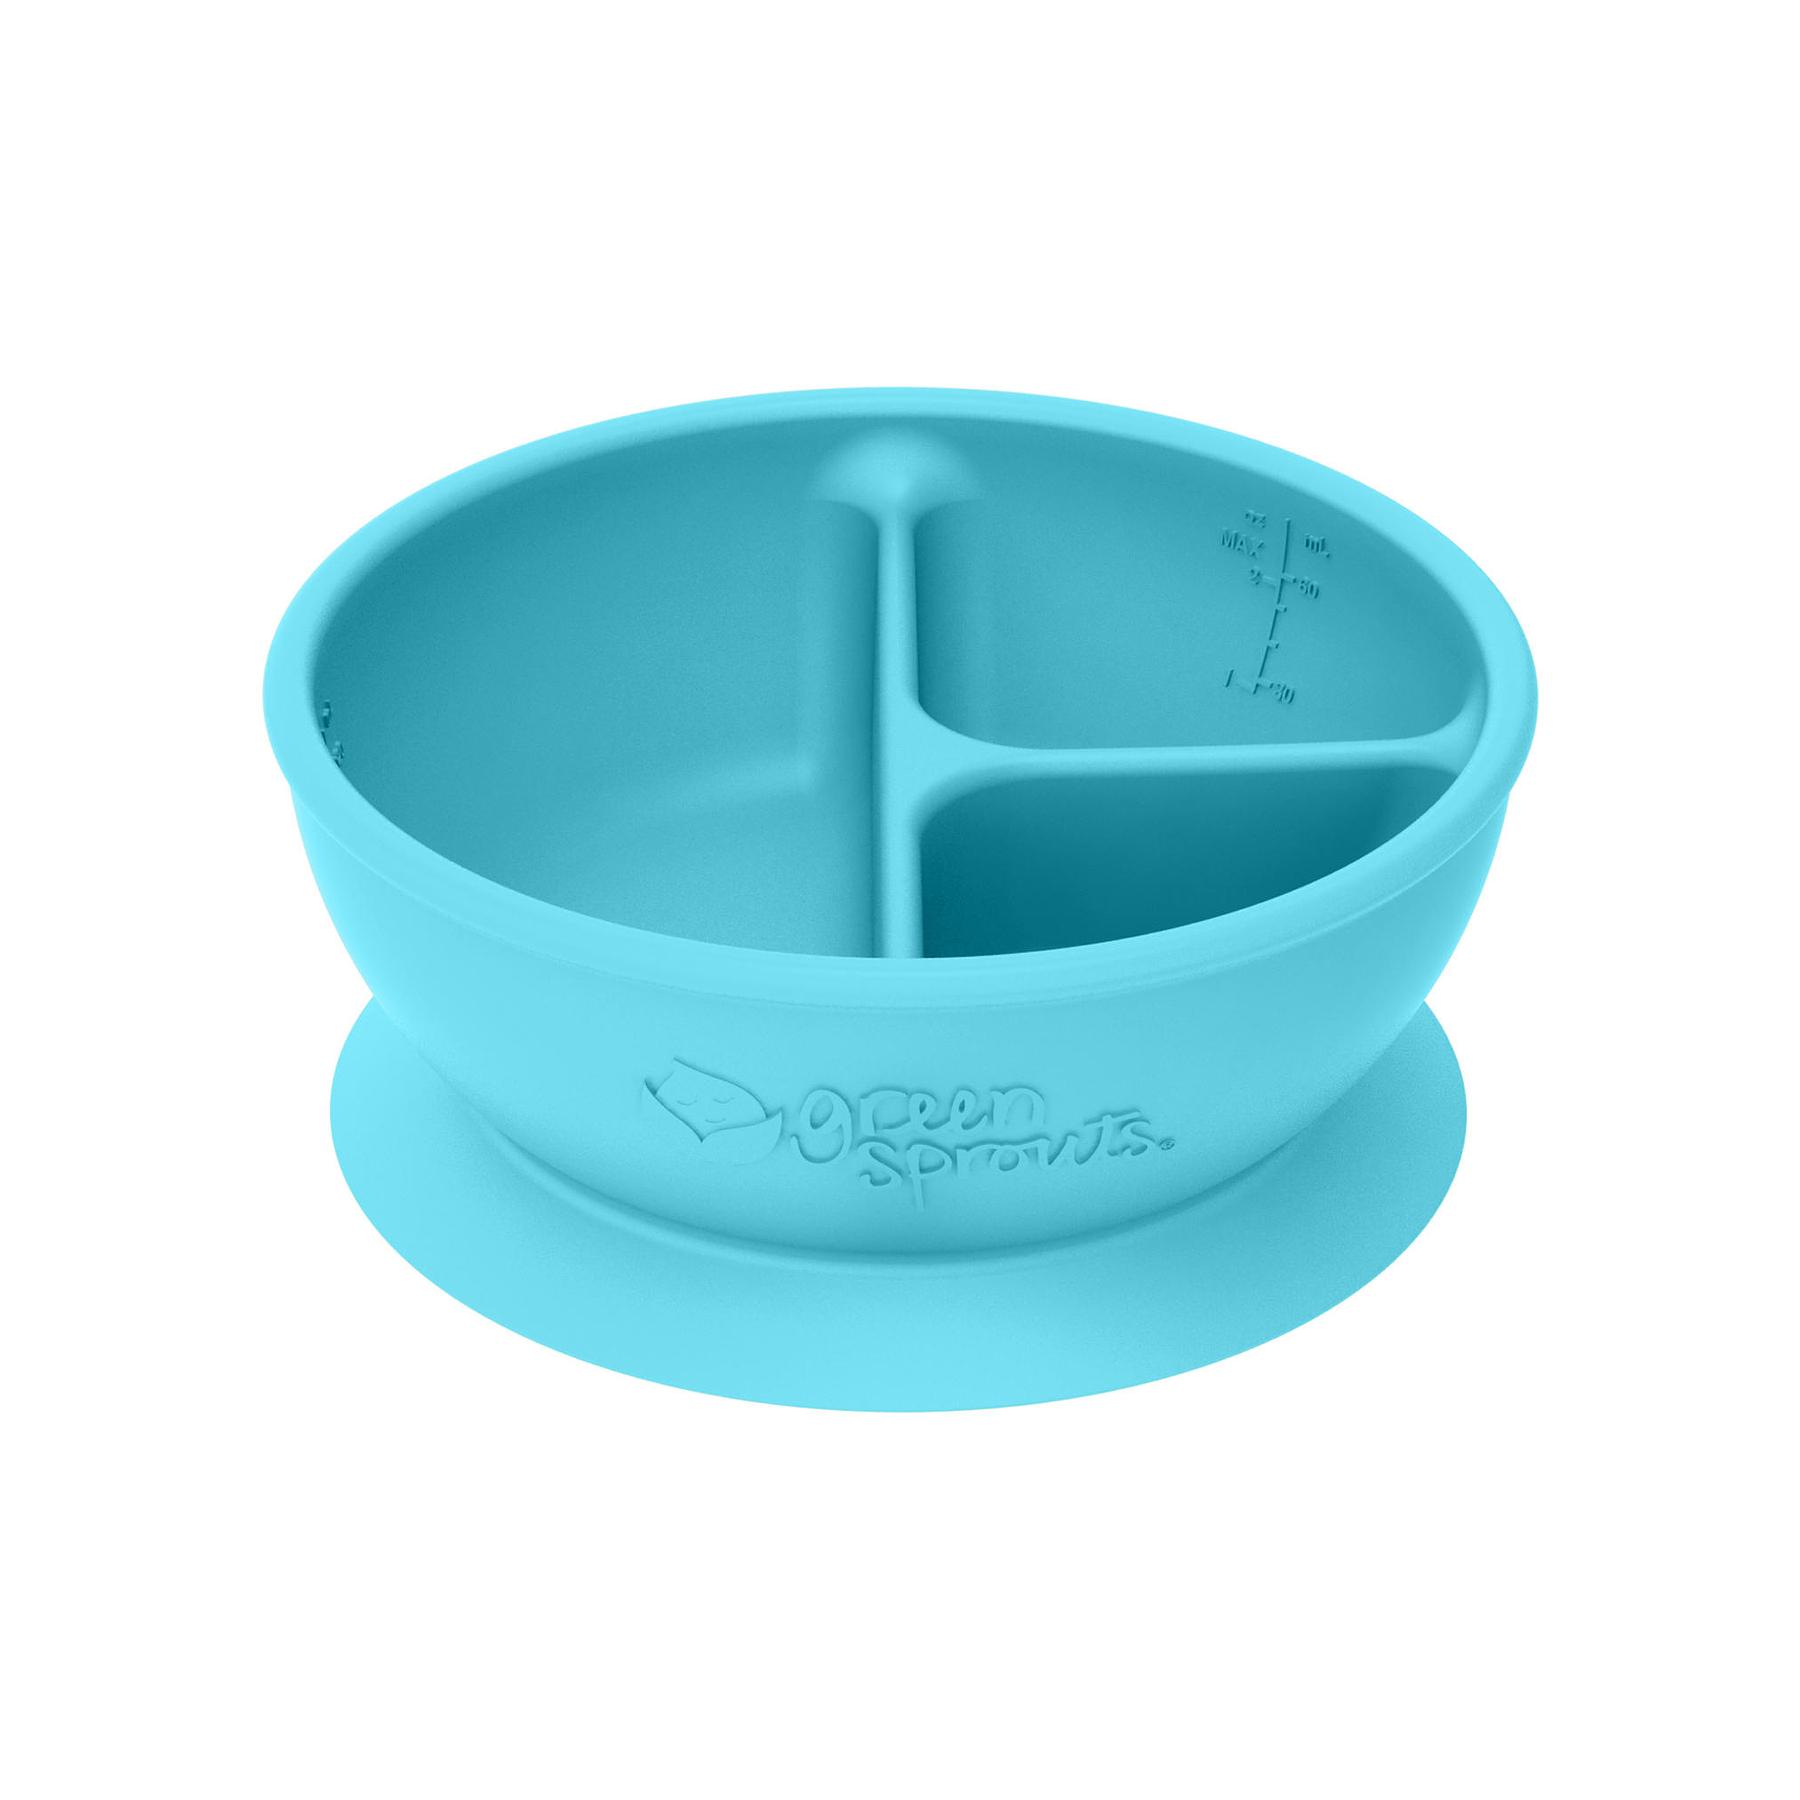 Bowl Adherente 100% Silicona Celeste